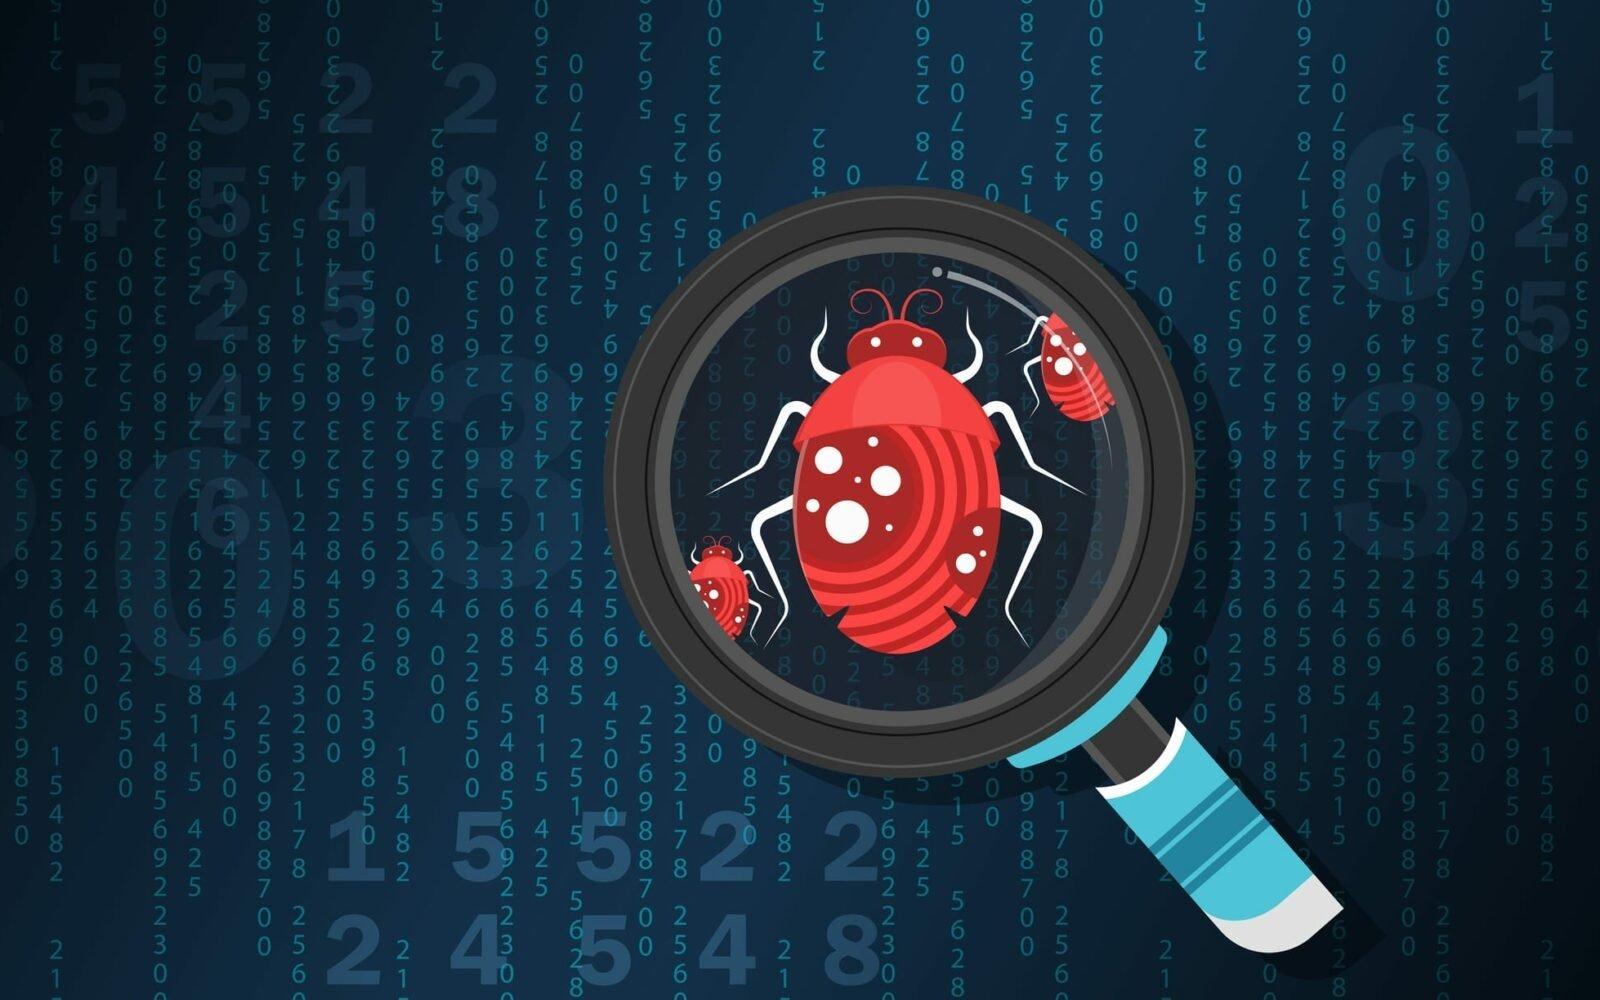 malware a ser analisado